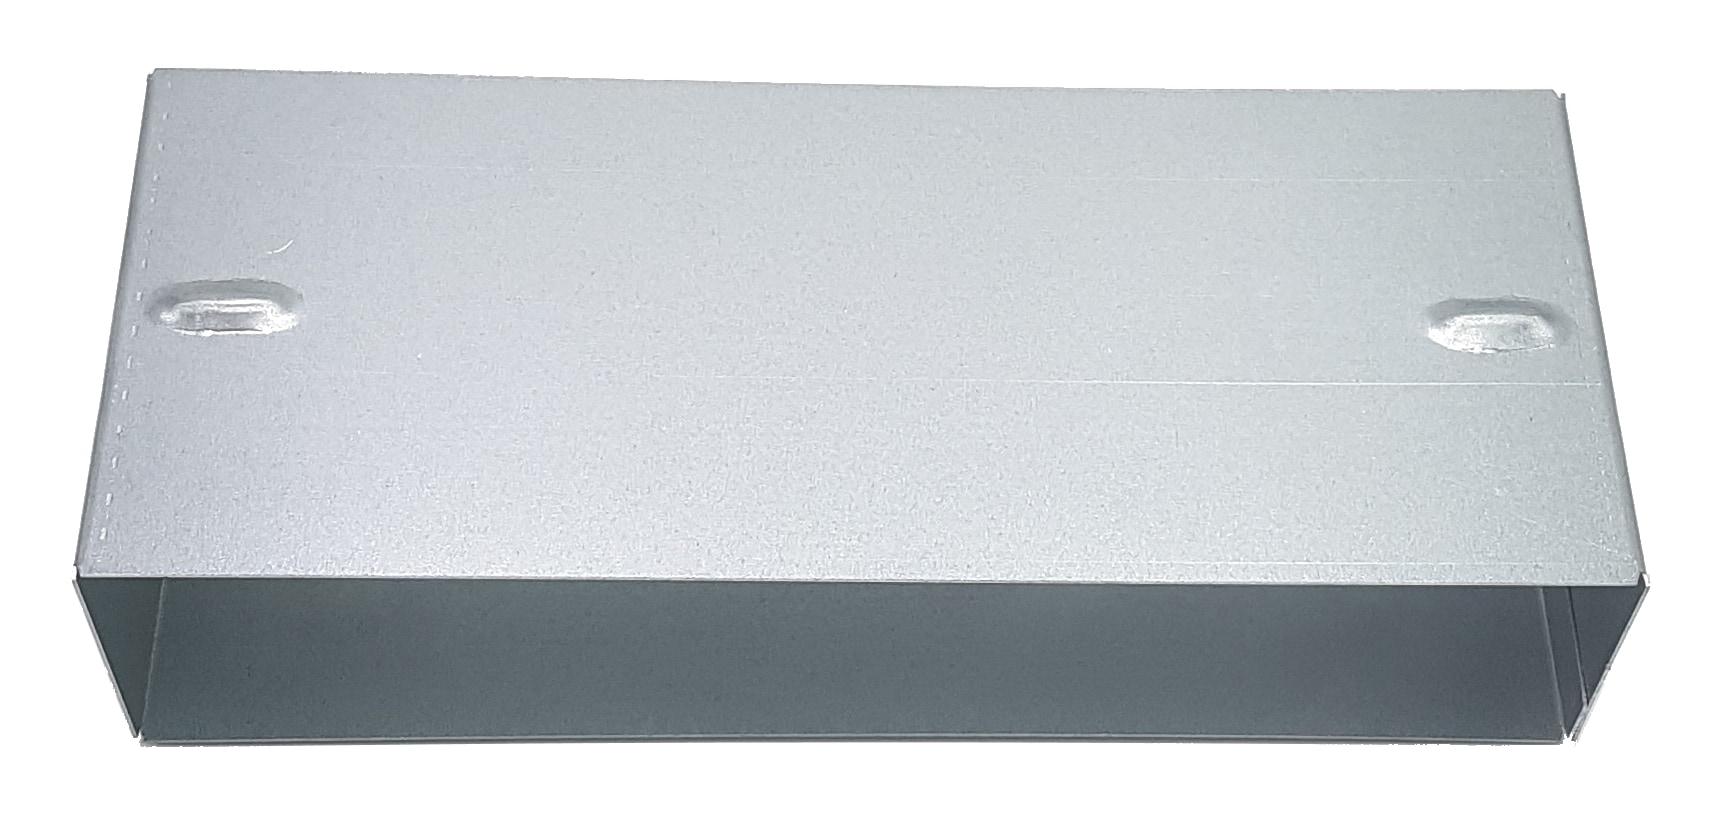 Flachkanalverbinder (Nippel) 300 mm